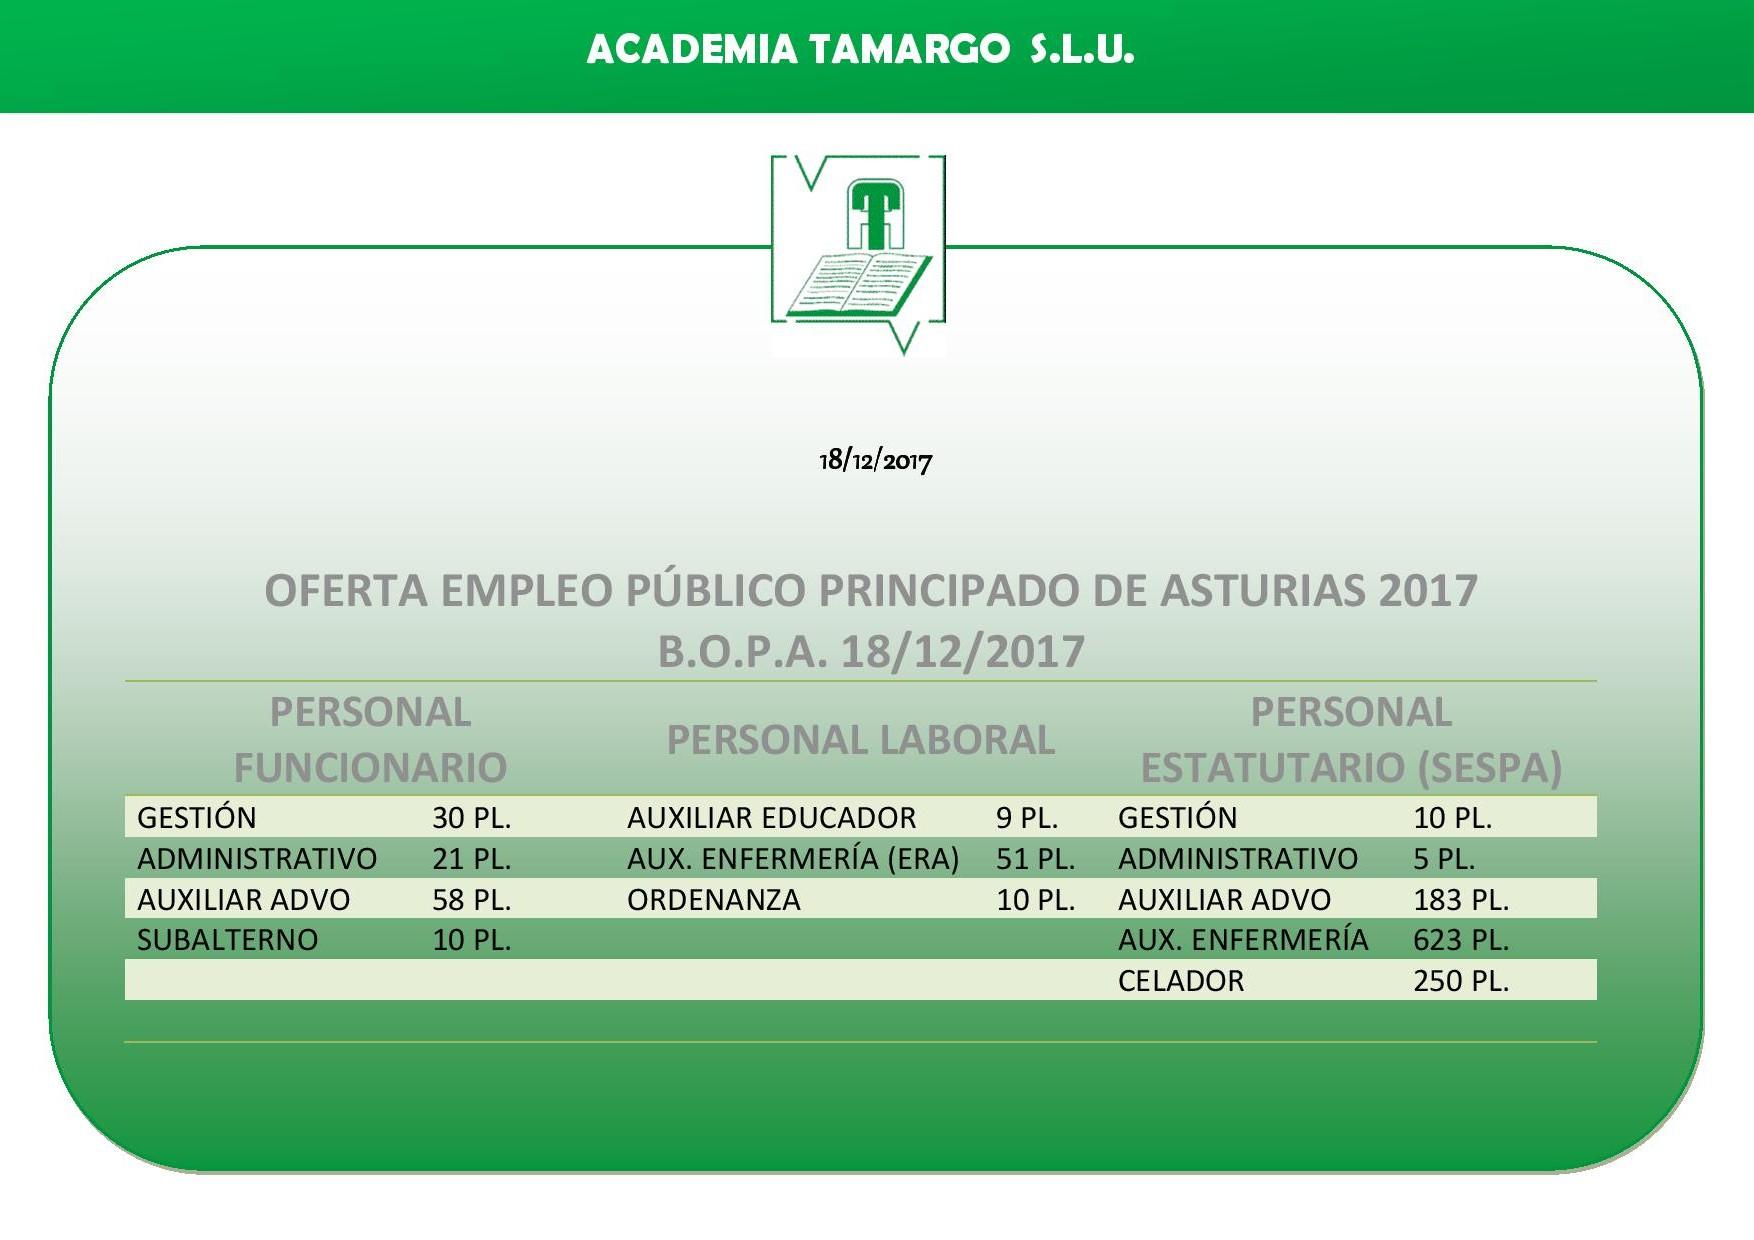 OEP PRINCIPADO 2017